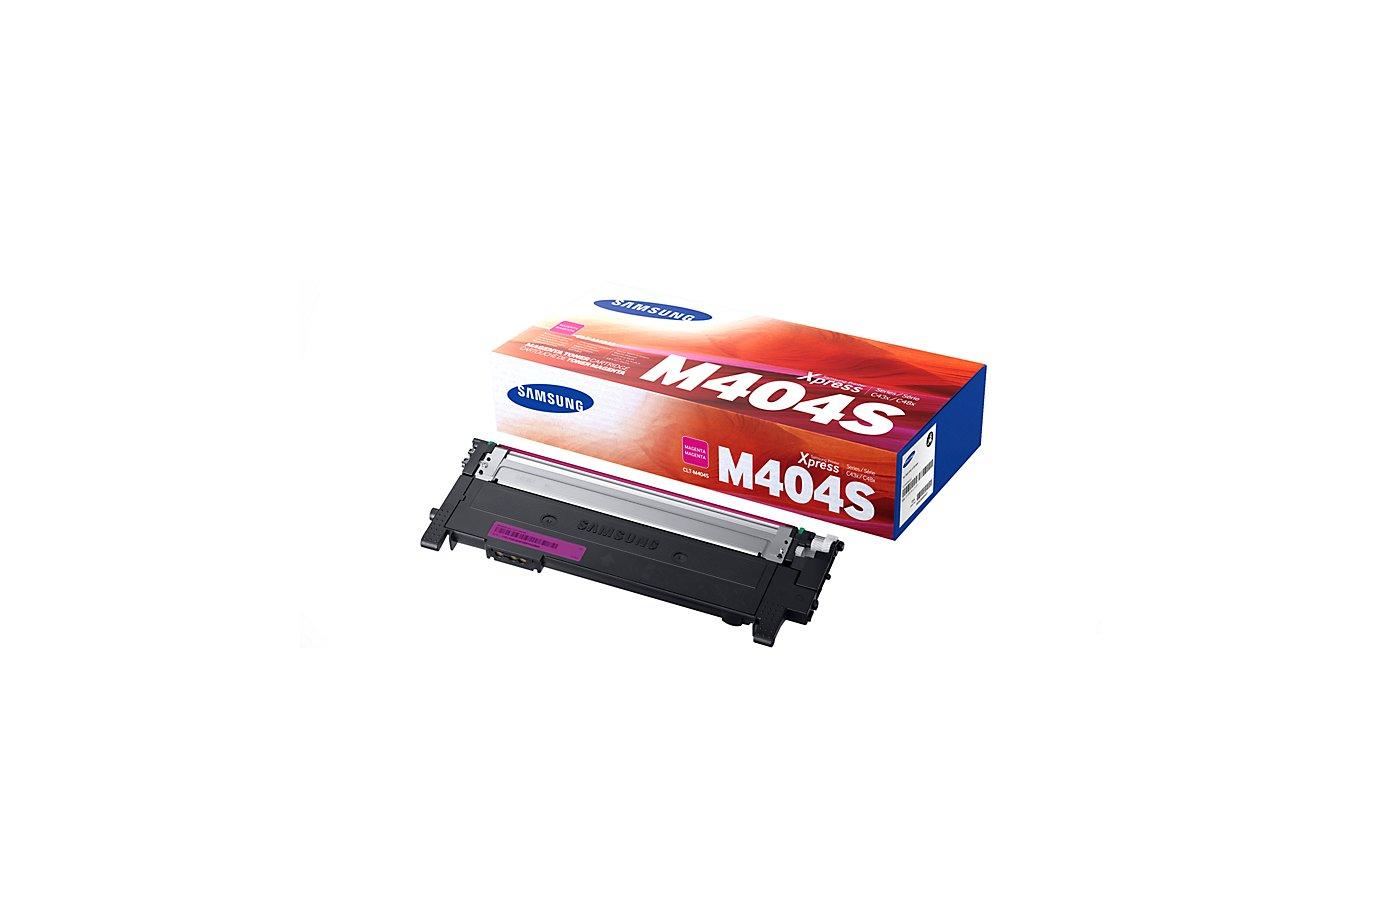 Картридж лазерный Samsung CLT-M404S/XEV пурпурный (1000стр.)